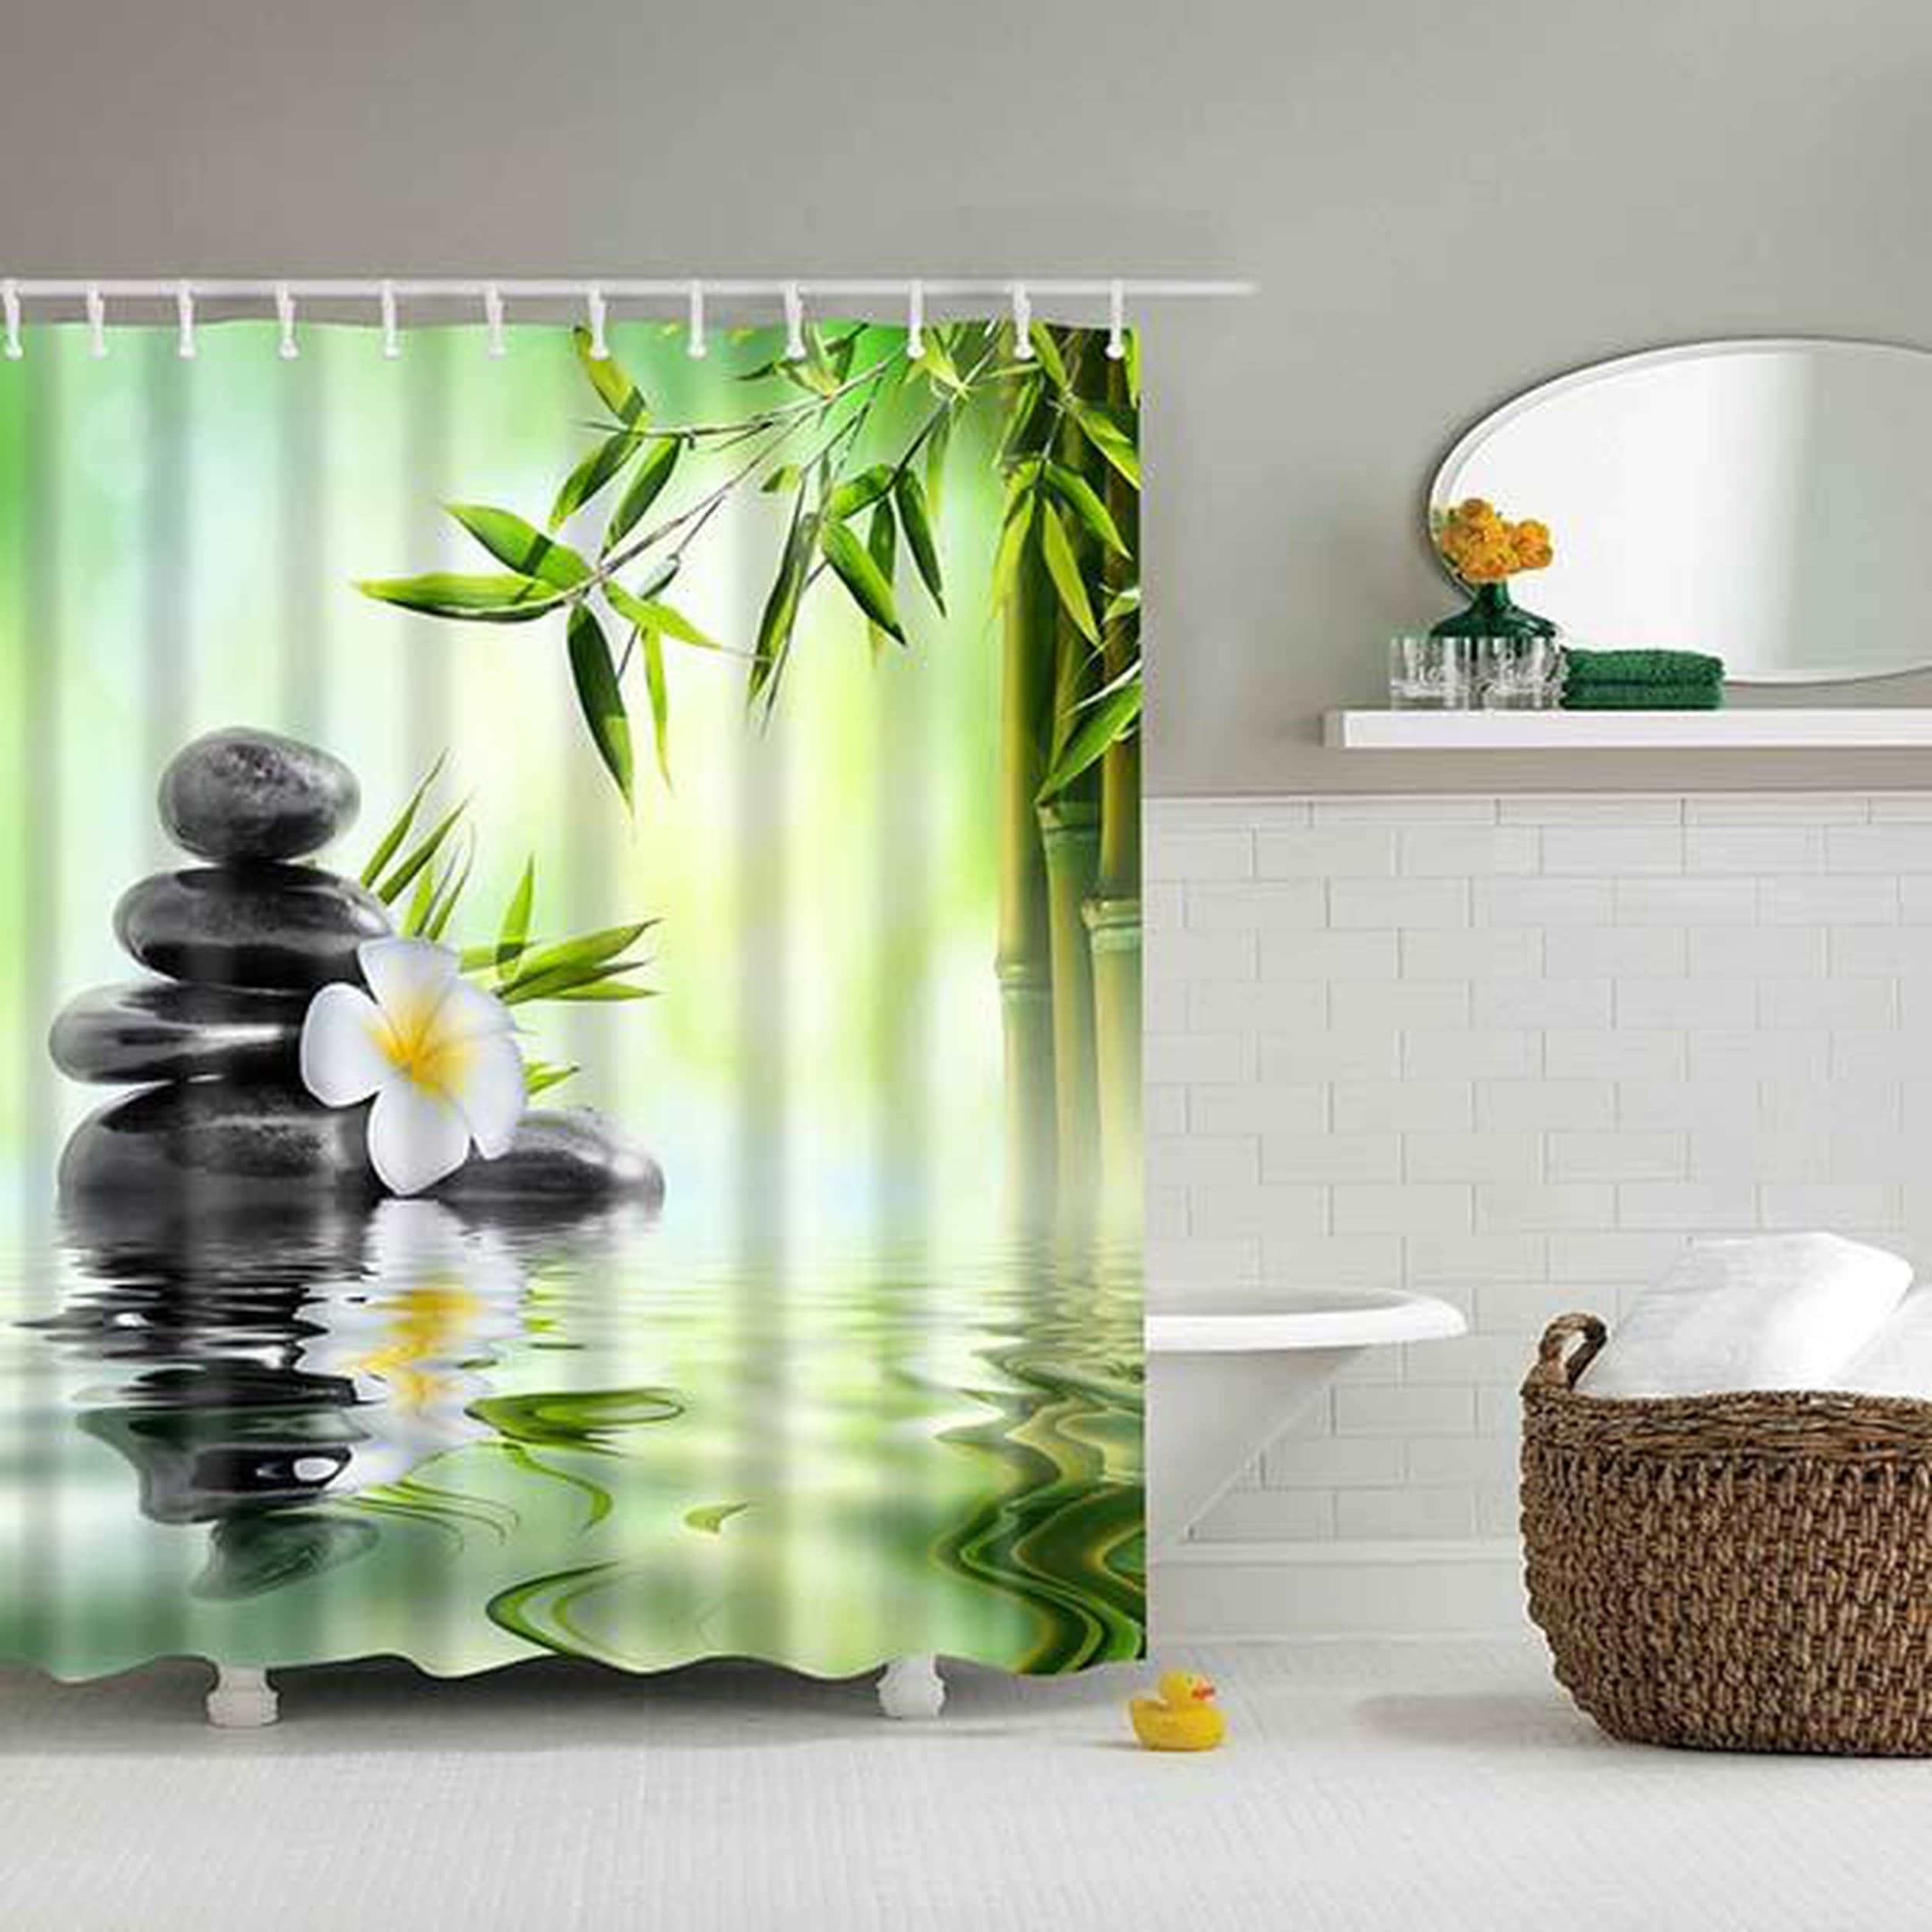 Shop Black Friday Deals On Bathroom Shower Curtains 3d Decor Nautical Shower Curtain Overstock 25414585